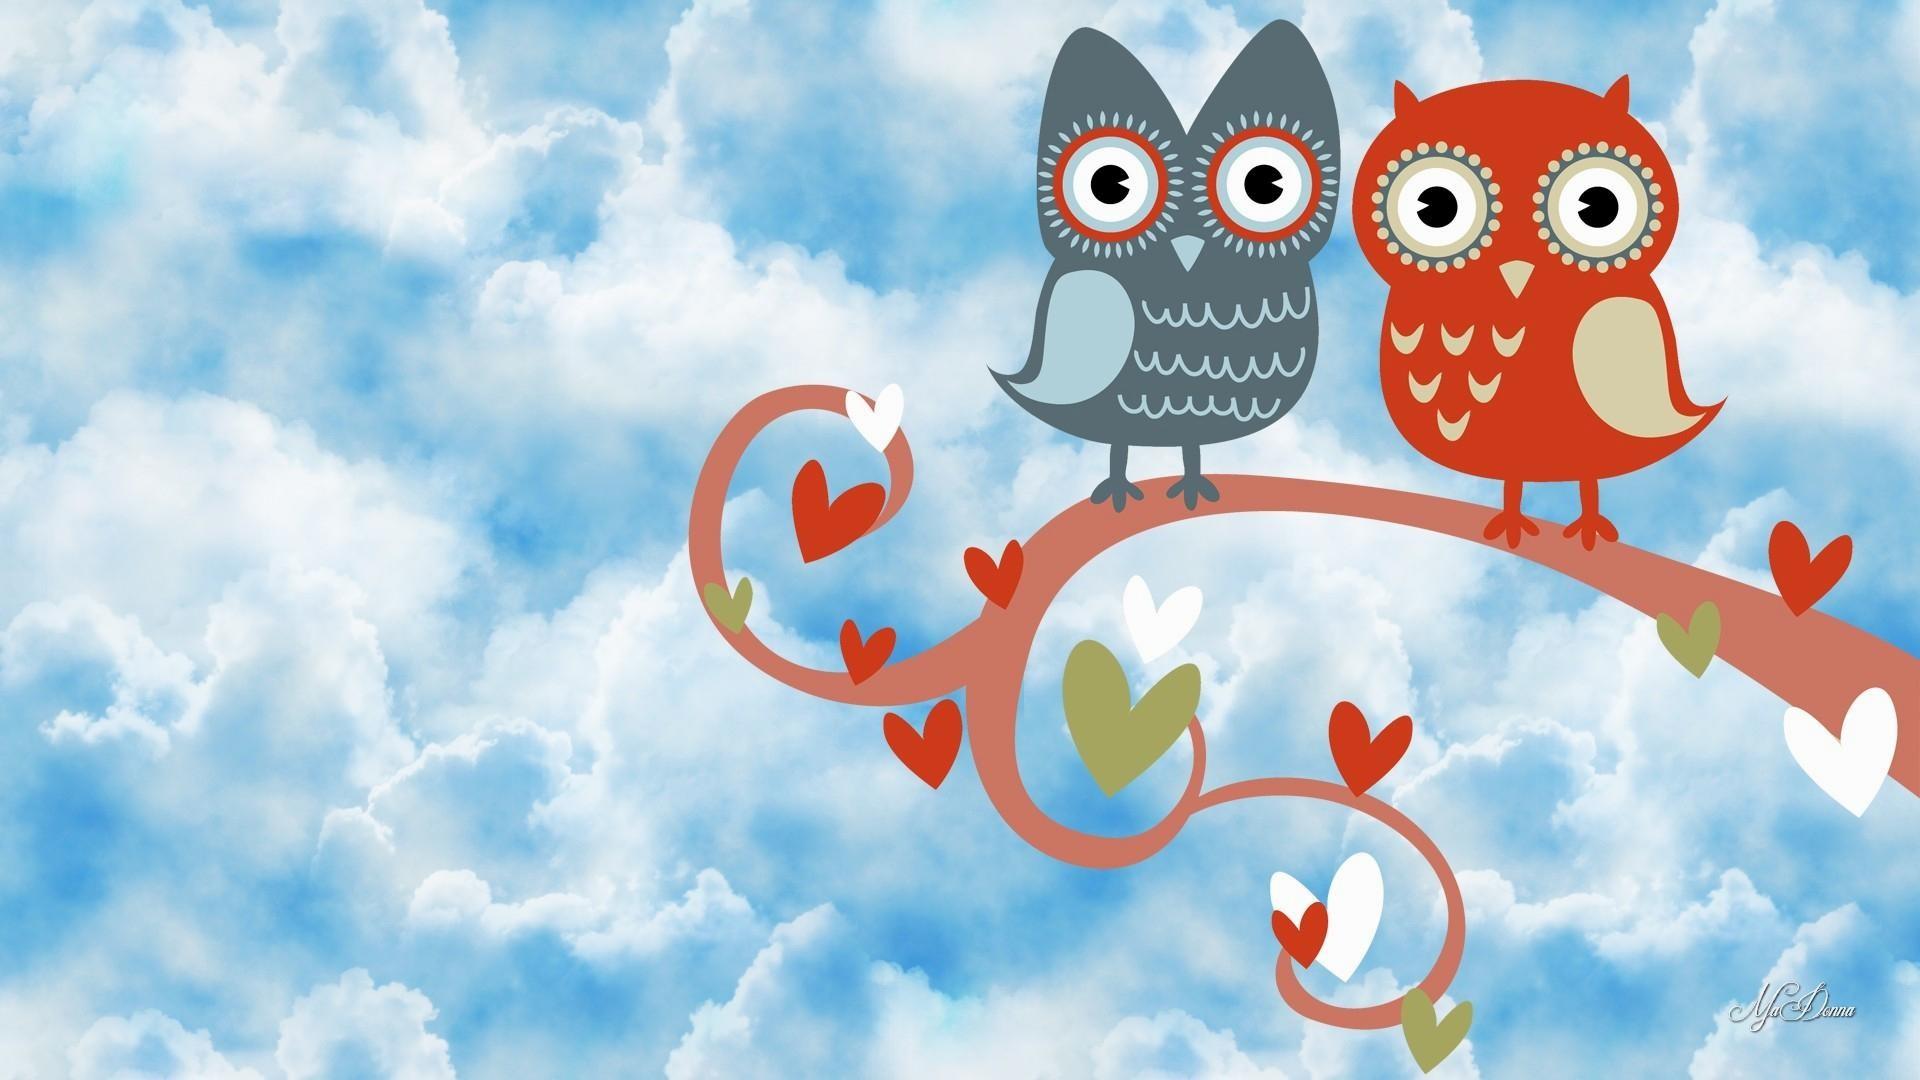 wallpaper.wiki-HD-Cute-Owl-Photos-PIC-WPE009833